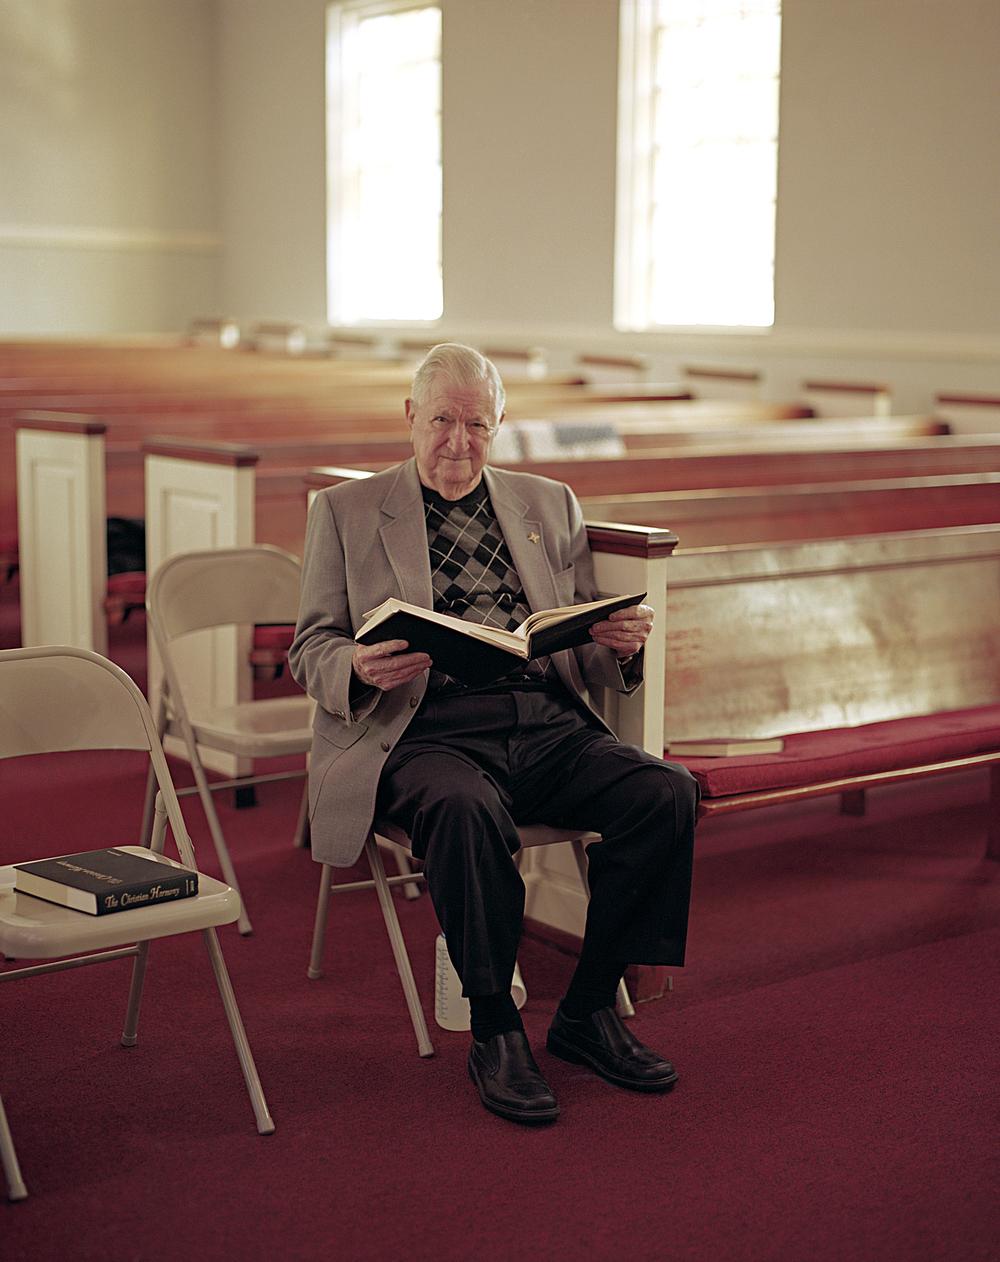 Hugh McGraw, Hardeman Primitive Baptist Church Resized.jpg